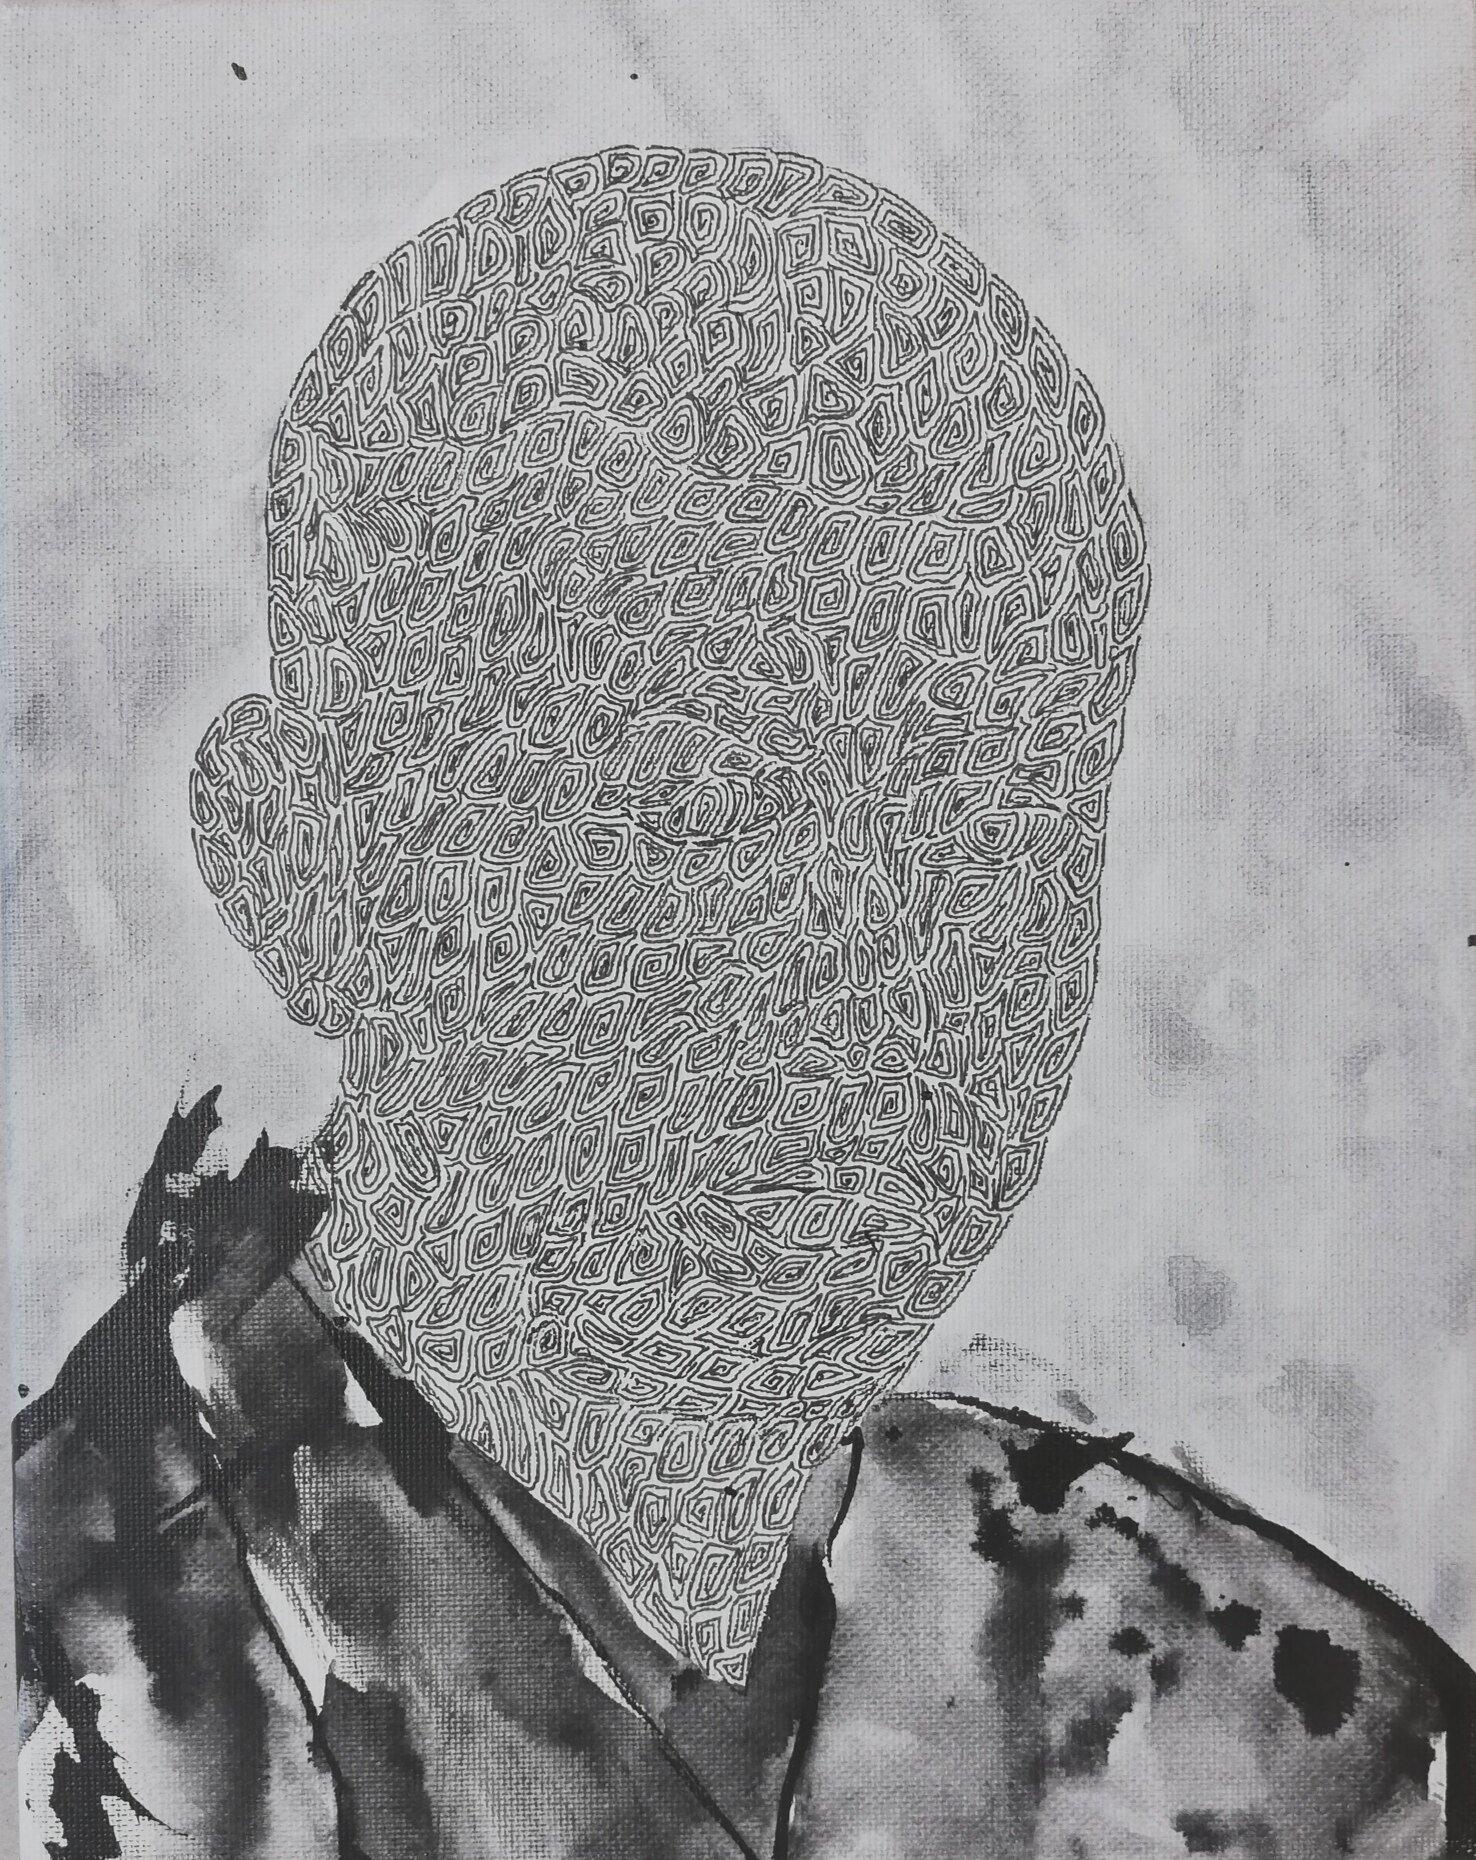 SANF055 Naoki Fuku_No Longer Human(Mushanokji)_Ink, acrylic, watercolor and brush pen on canvas_18x24cm_2019.jpg